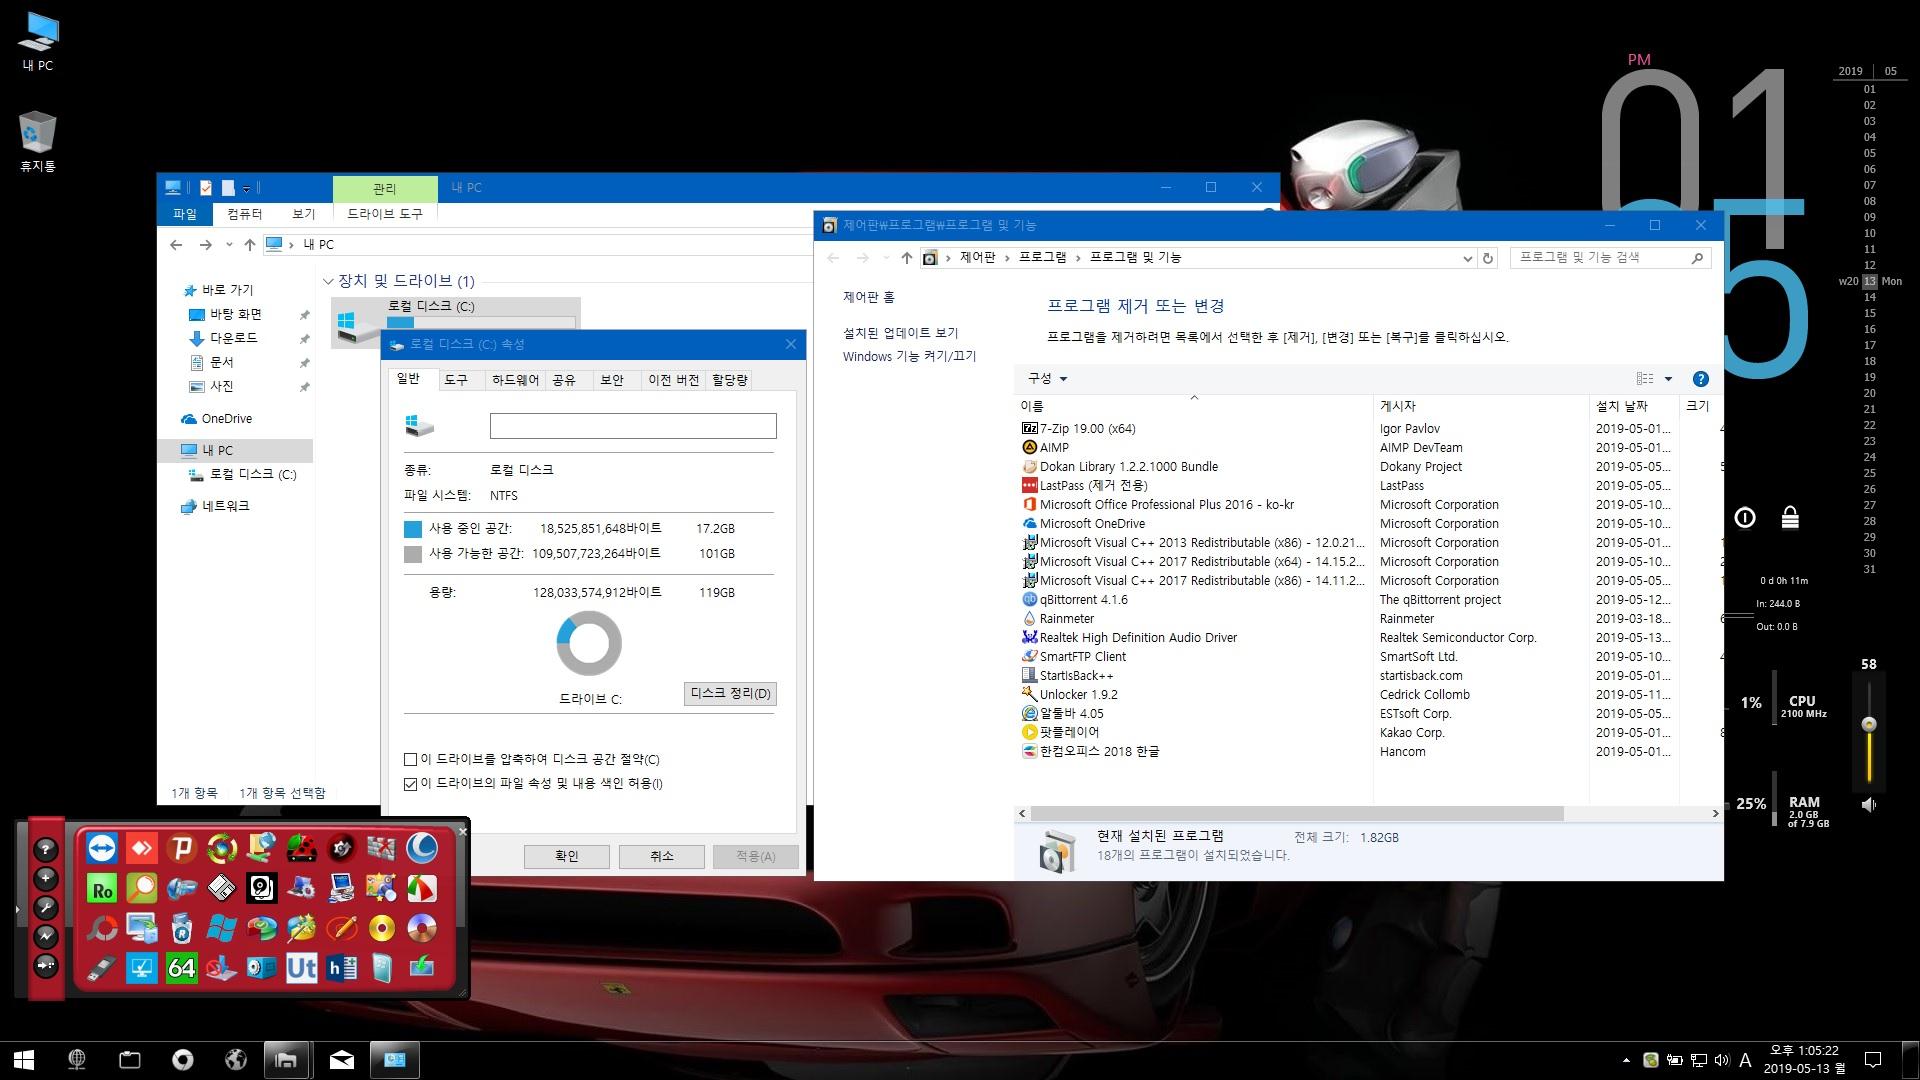 Windows 10 Pro for Workstations ST58 - 02.jpg